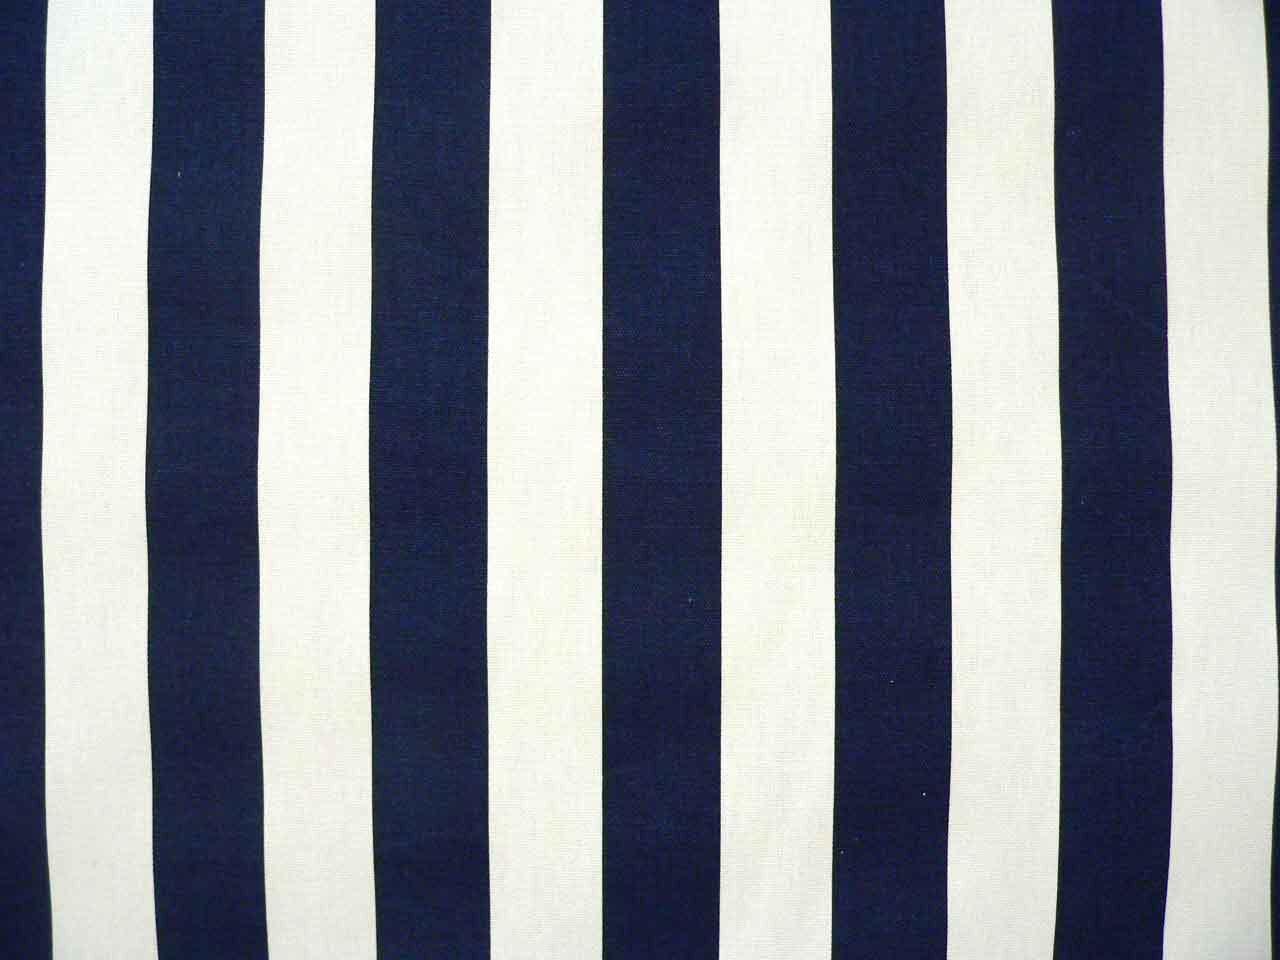 Upholstery fabric drapery fabric navy blue white stripe for Upholstery fabric children